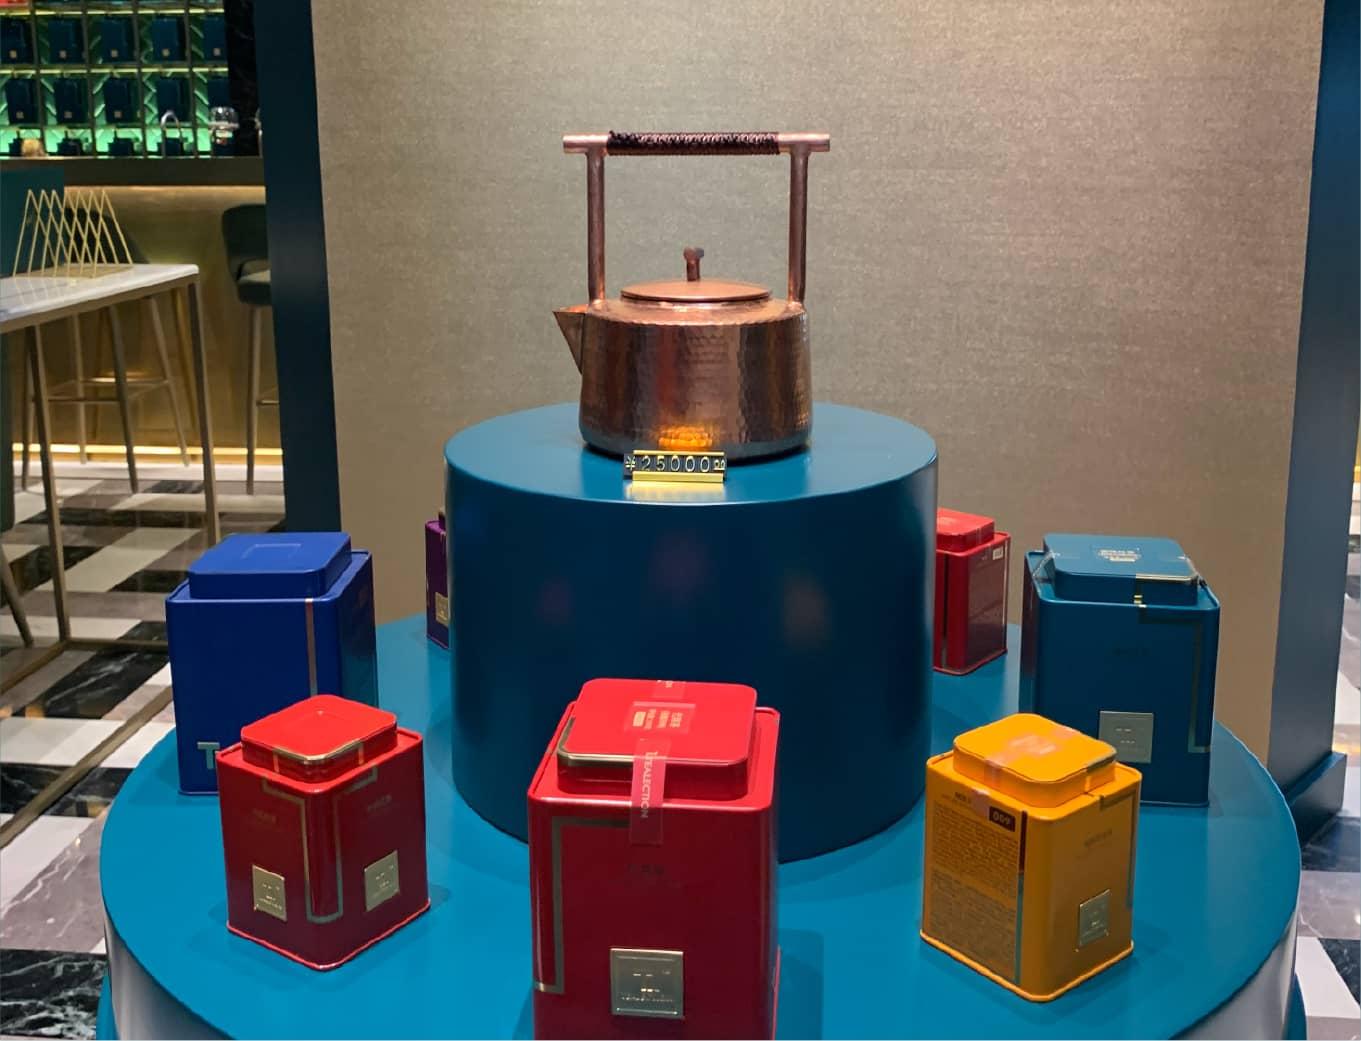 Teatones teapot design and showcase in retail China